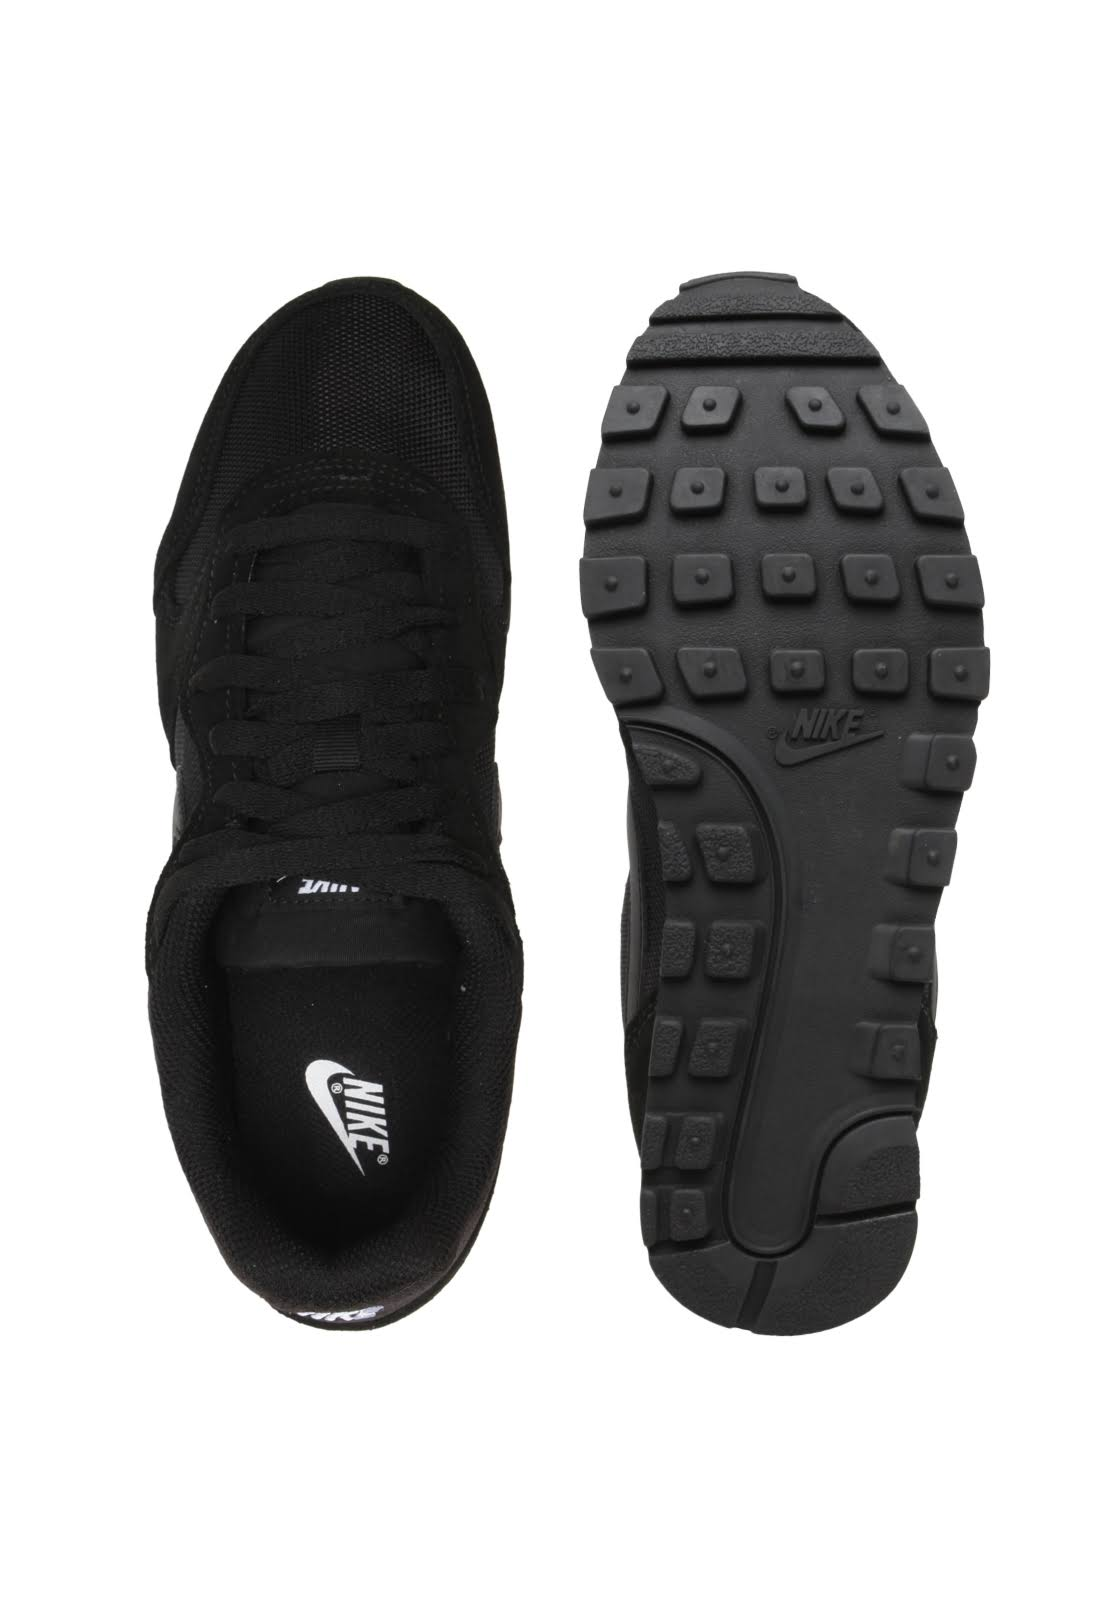 Runner Nero Md Sportswear Nike Wmns 2 lJFcuTK13